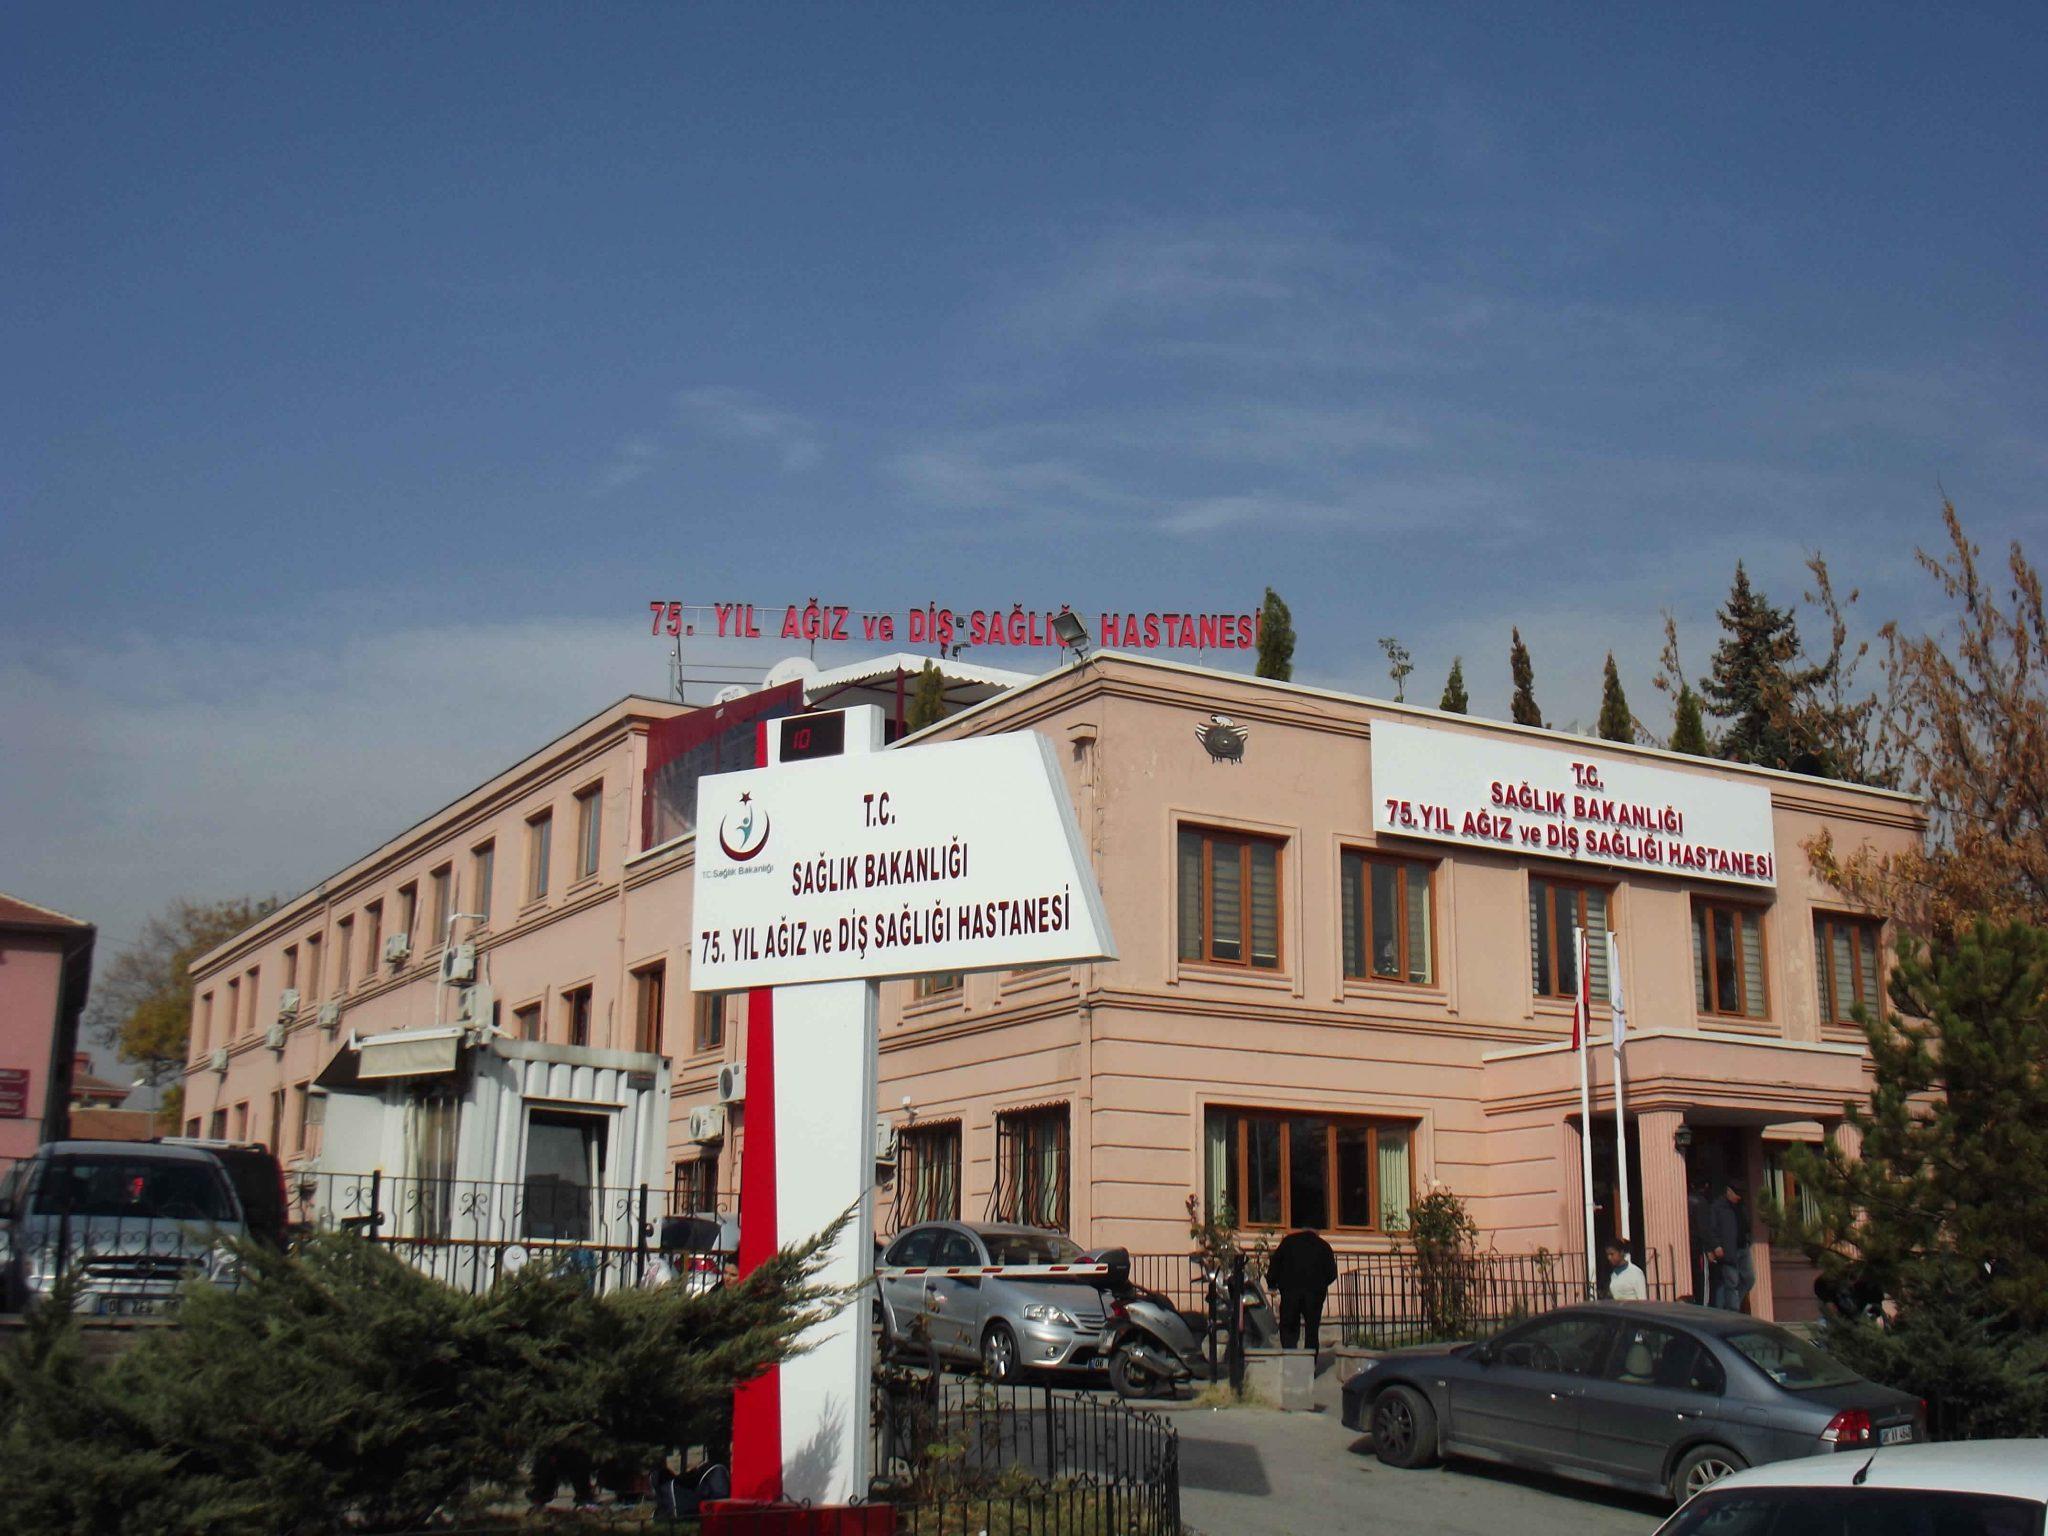 ankara-75-yil-agiz-ve-dis-sagligi-hastanesi-randevu-alma